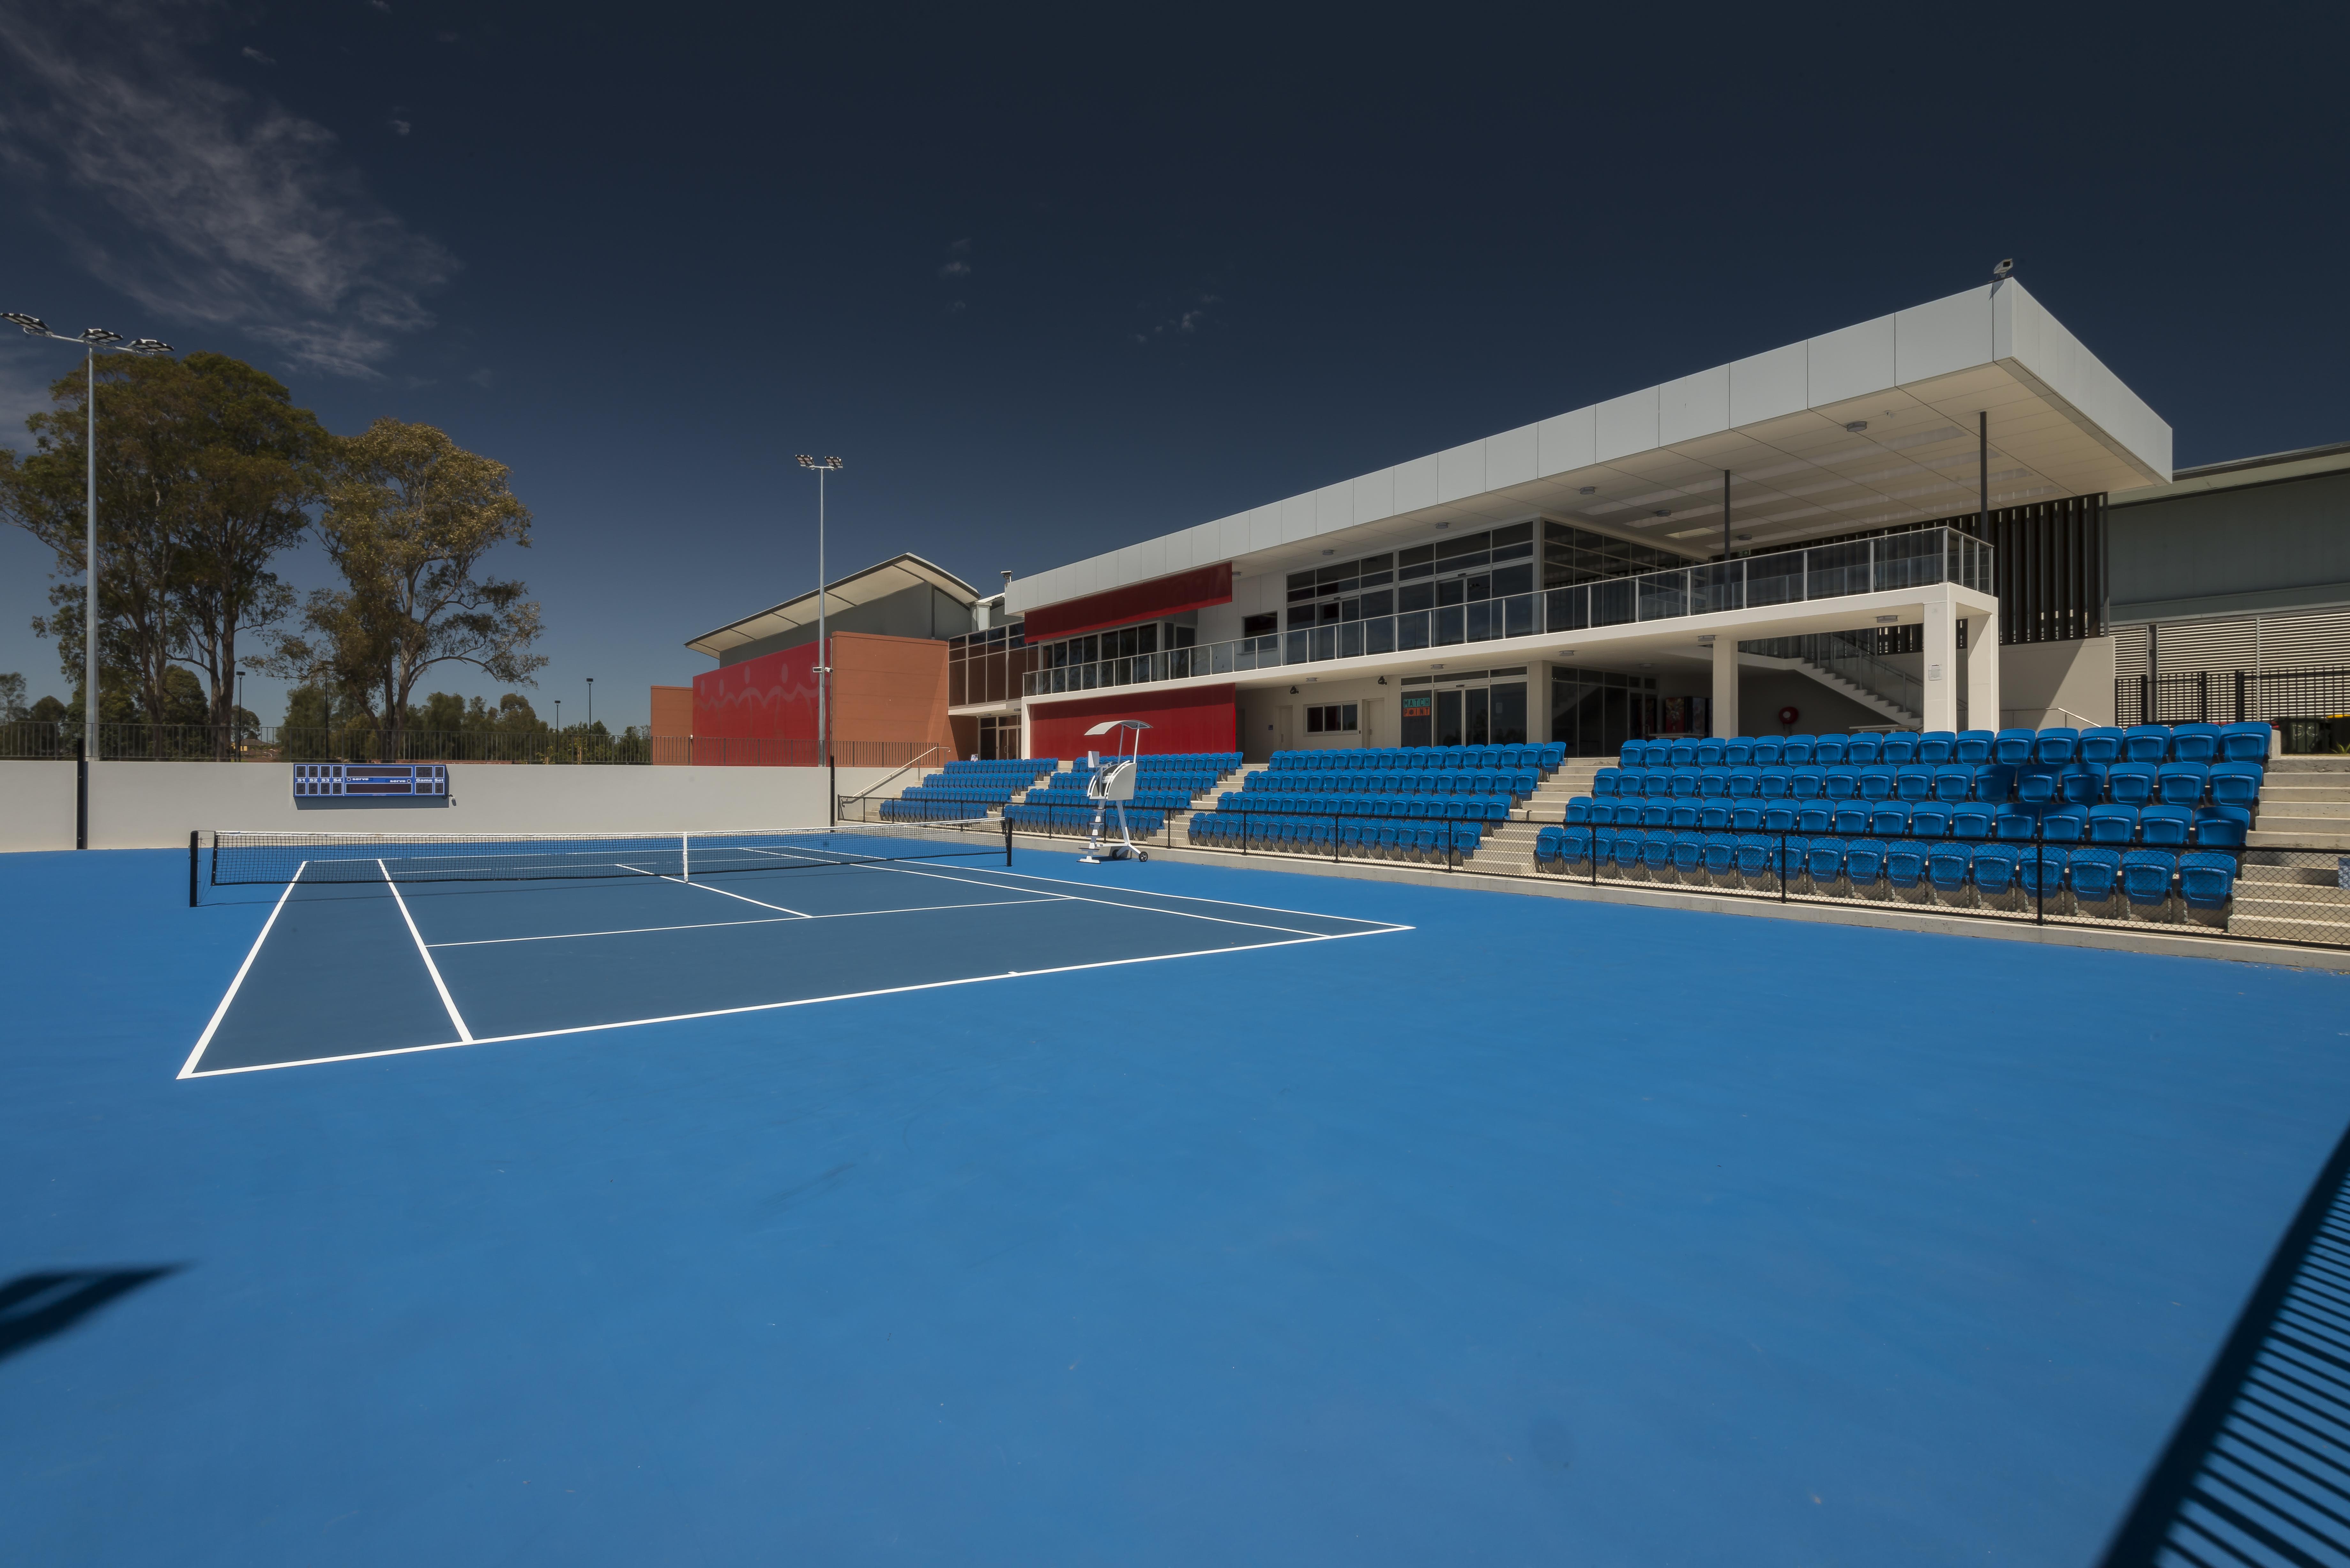 Endeavour hills tennis club